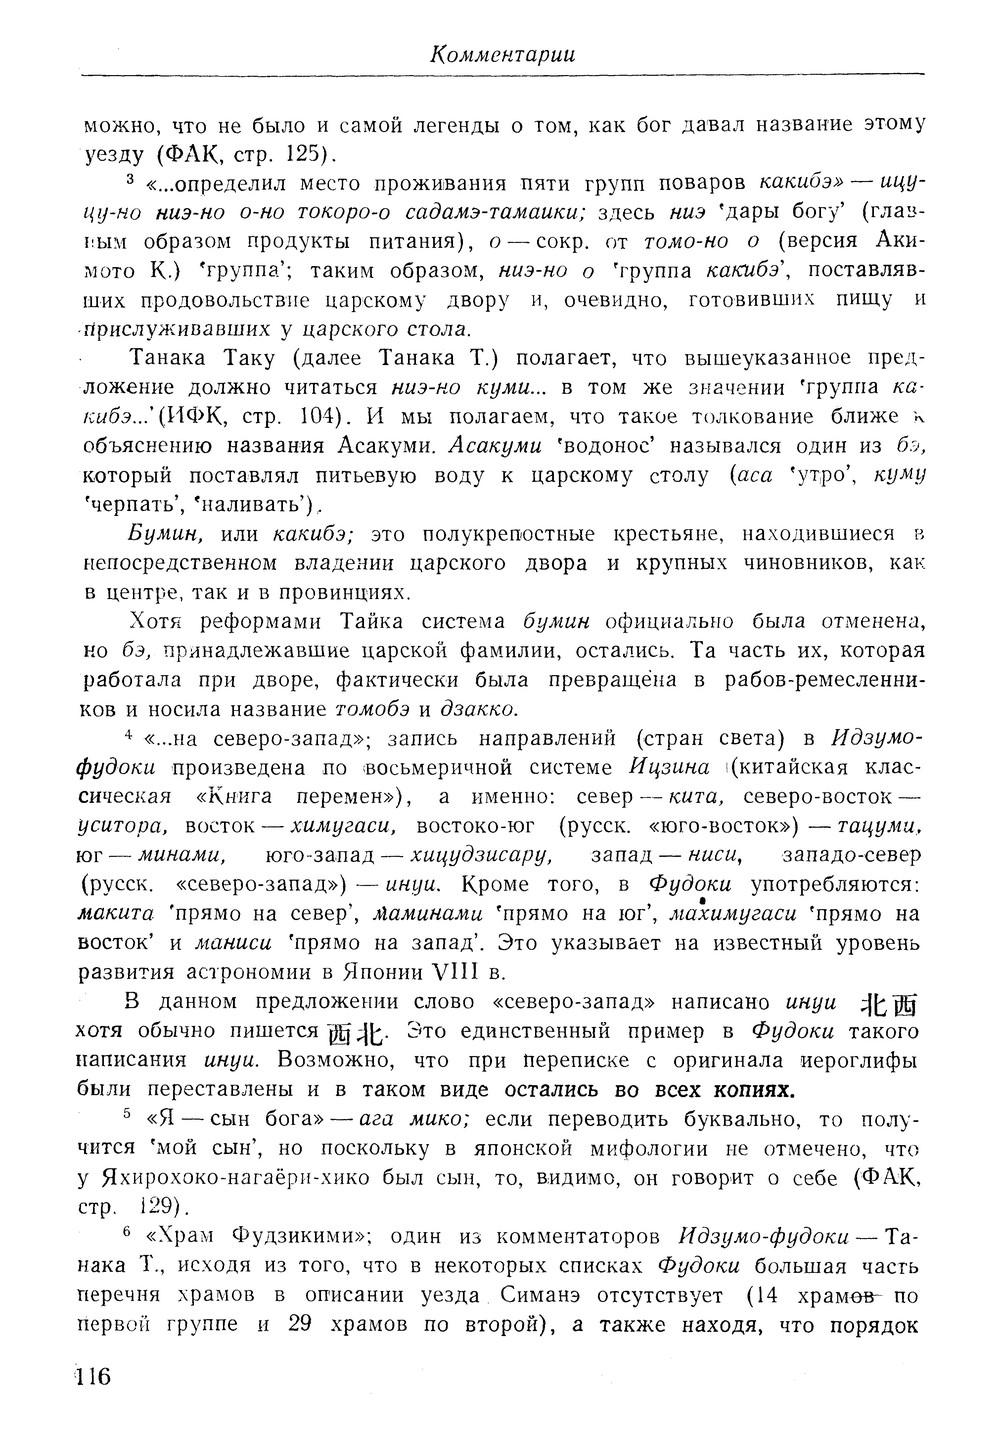 http://i5.imageban.ru/out/2014/01/20/6db4b7a8e71b921cd058cebfadd796c8.jpg